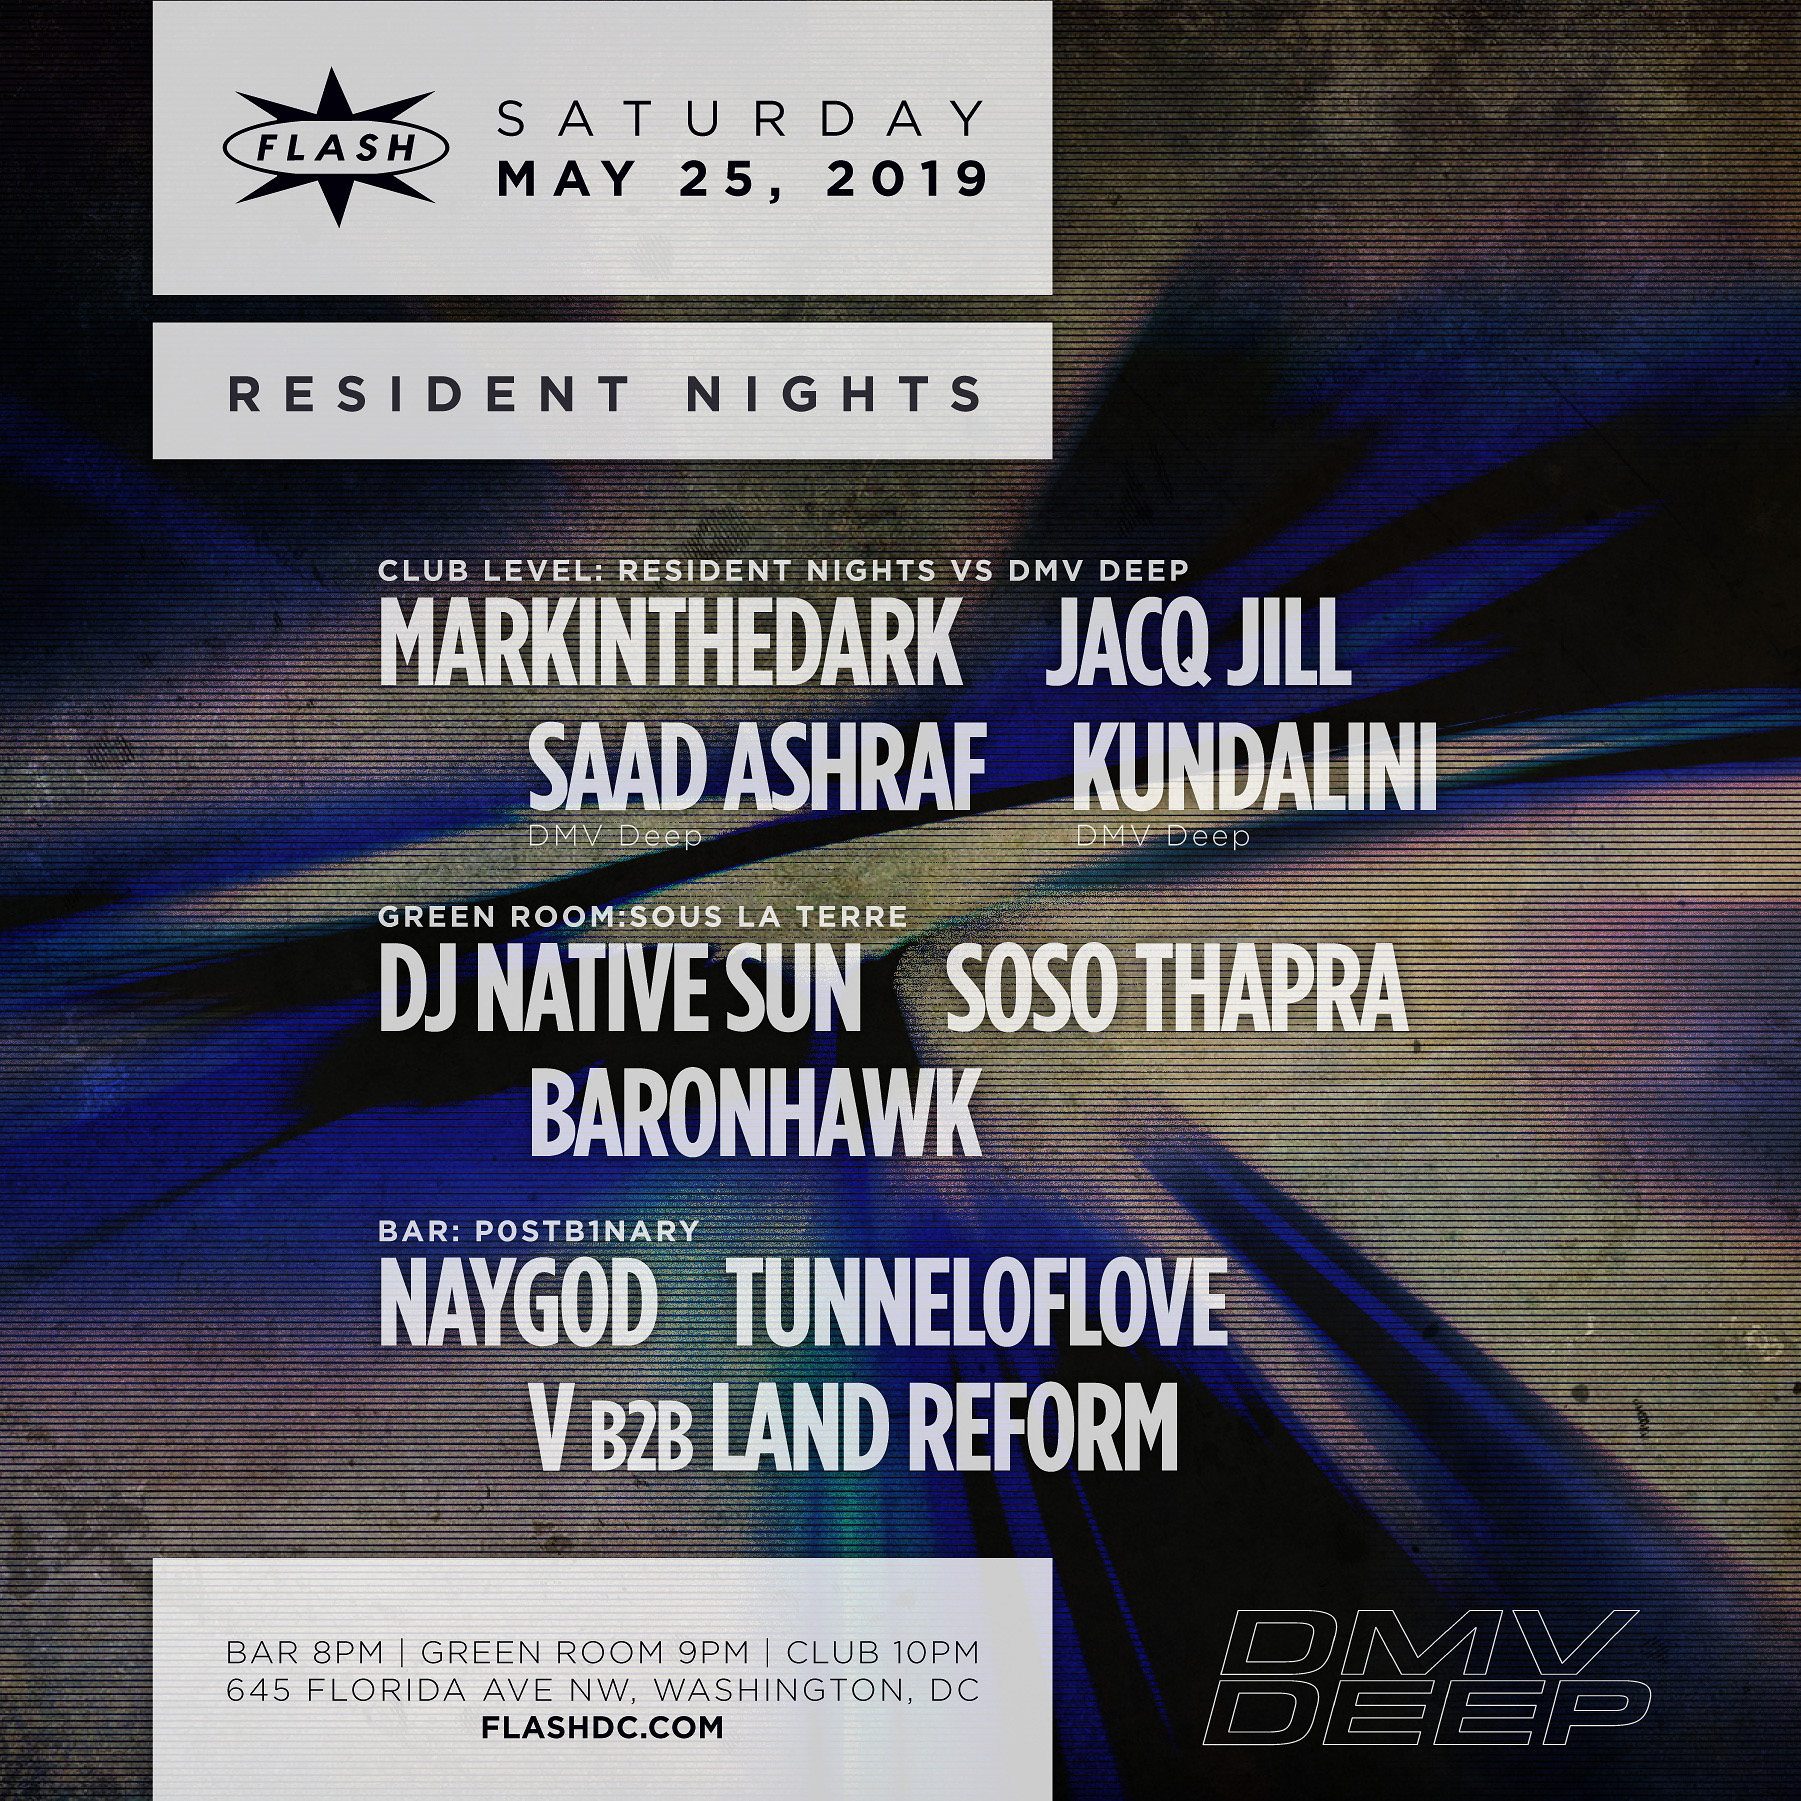 Resident Night: markintheDark - Jacq Jill - Saad Ashraf - Kundalini high quality event photo